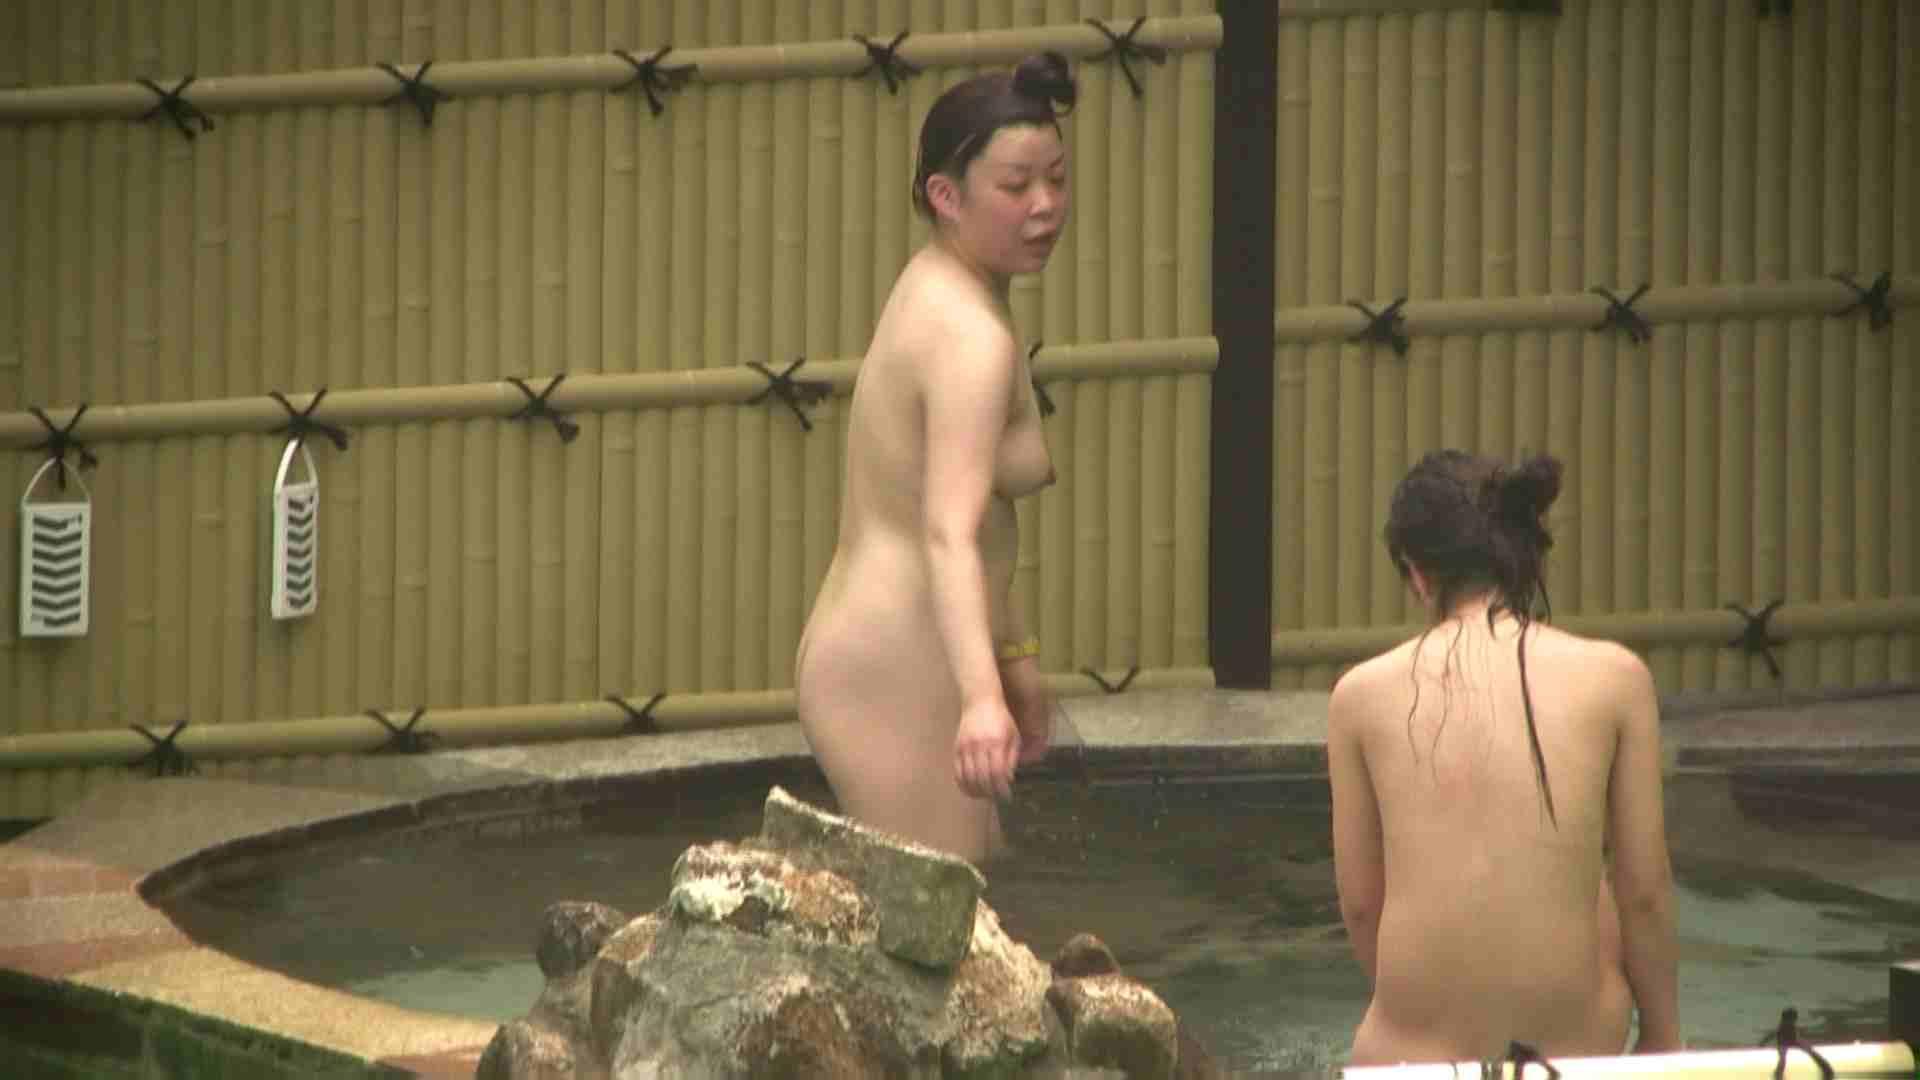 高画質露天女風呂観察 vol.022 望遠映像 AV動画キャプチャ 86PIX 77